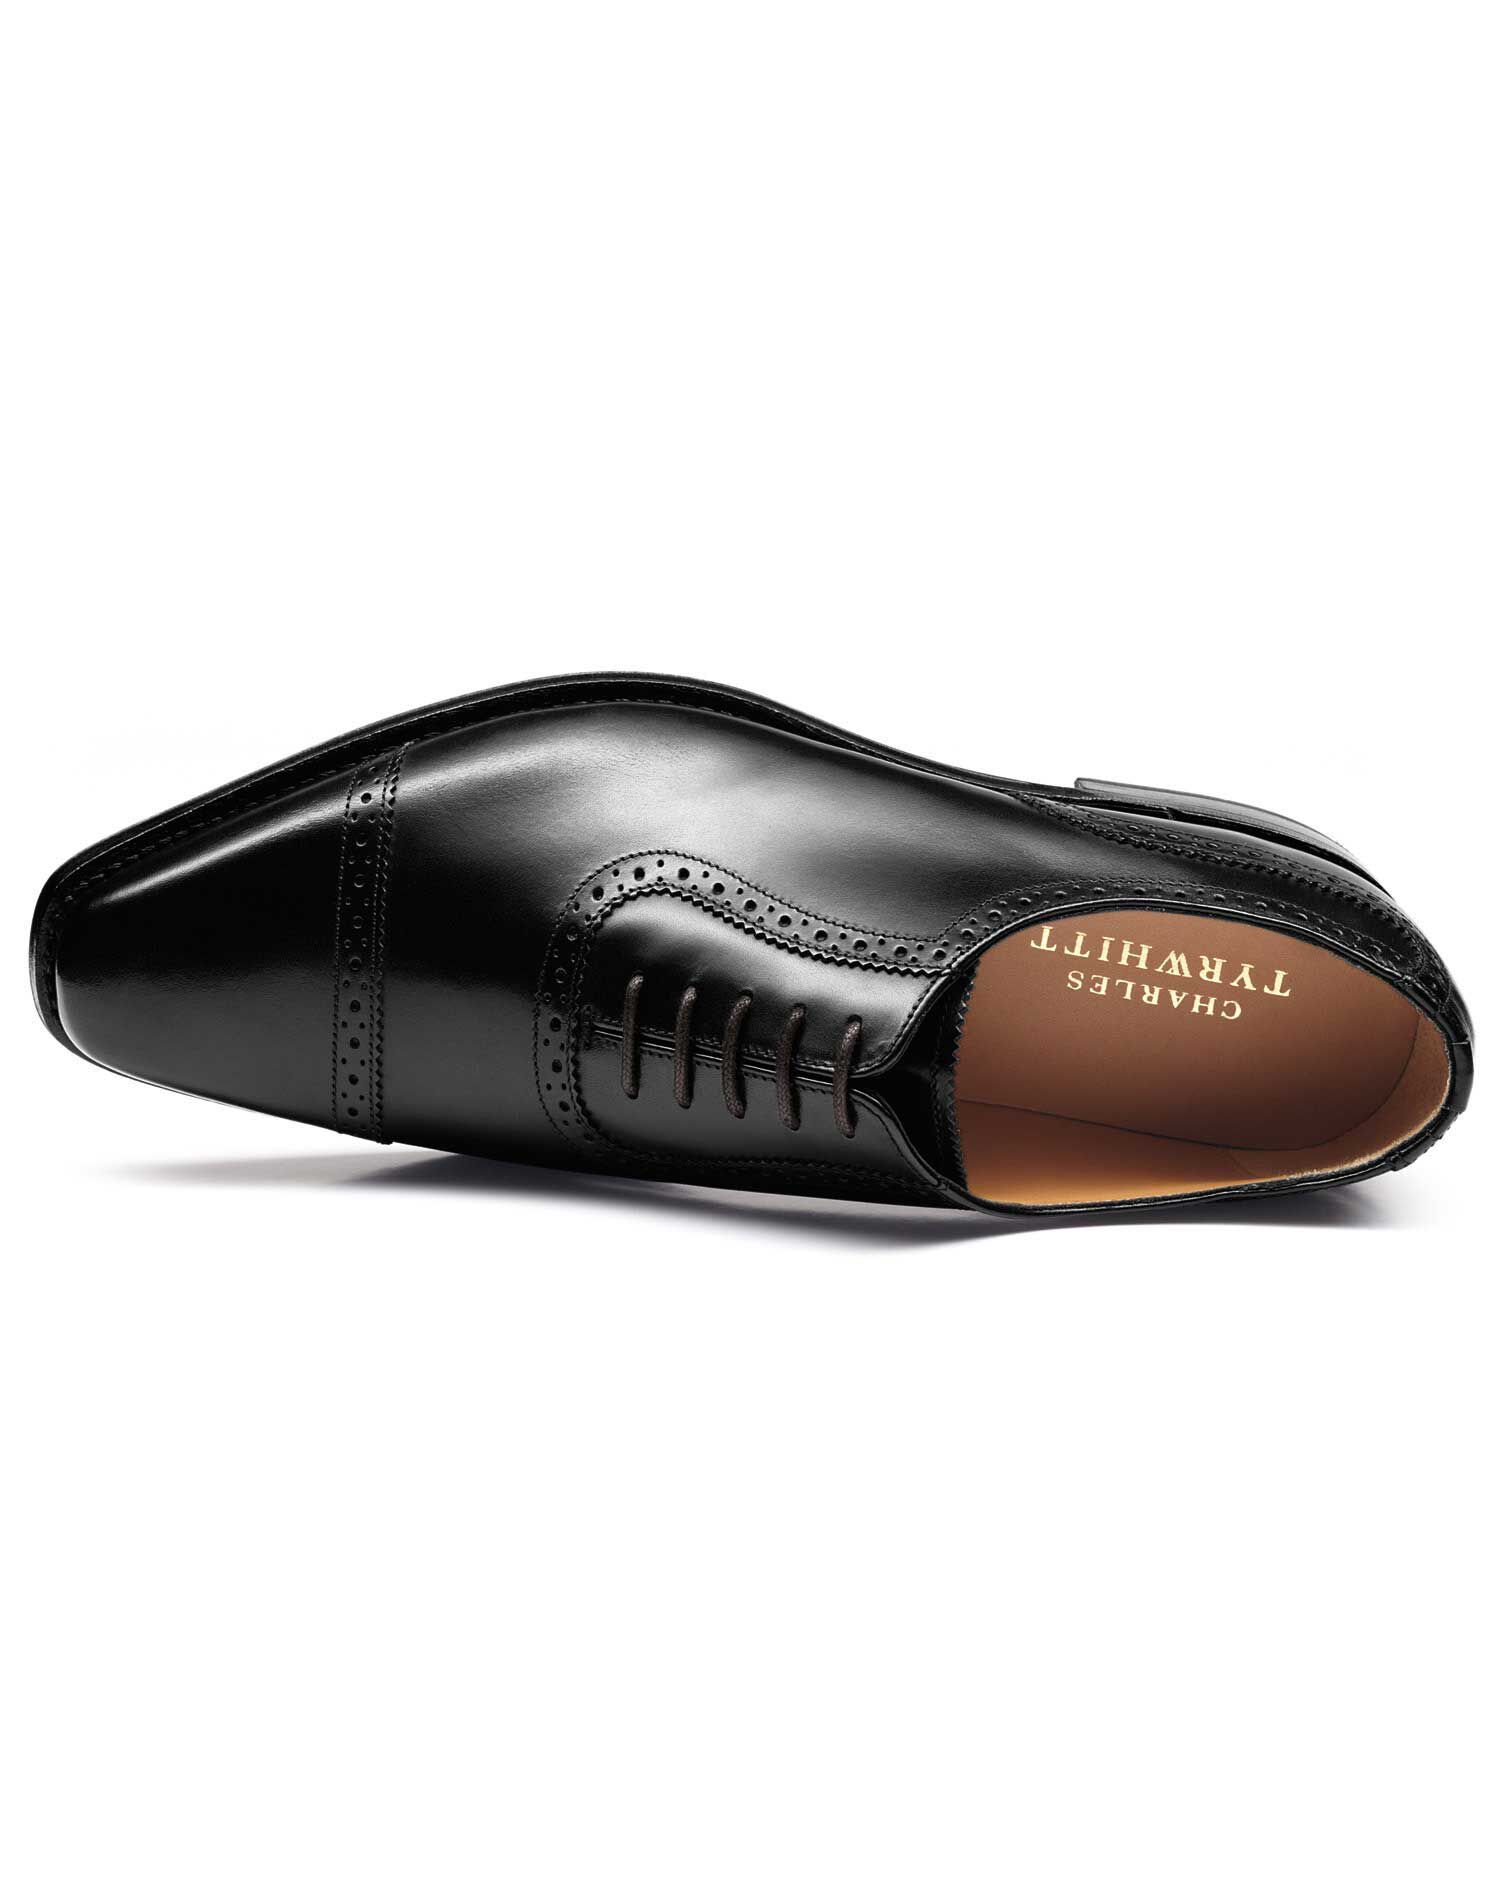 Black Baxter Toe Cap Brogue Oxford Shoes Size 6.5 R by Charles Tyrwhitt